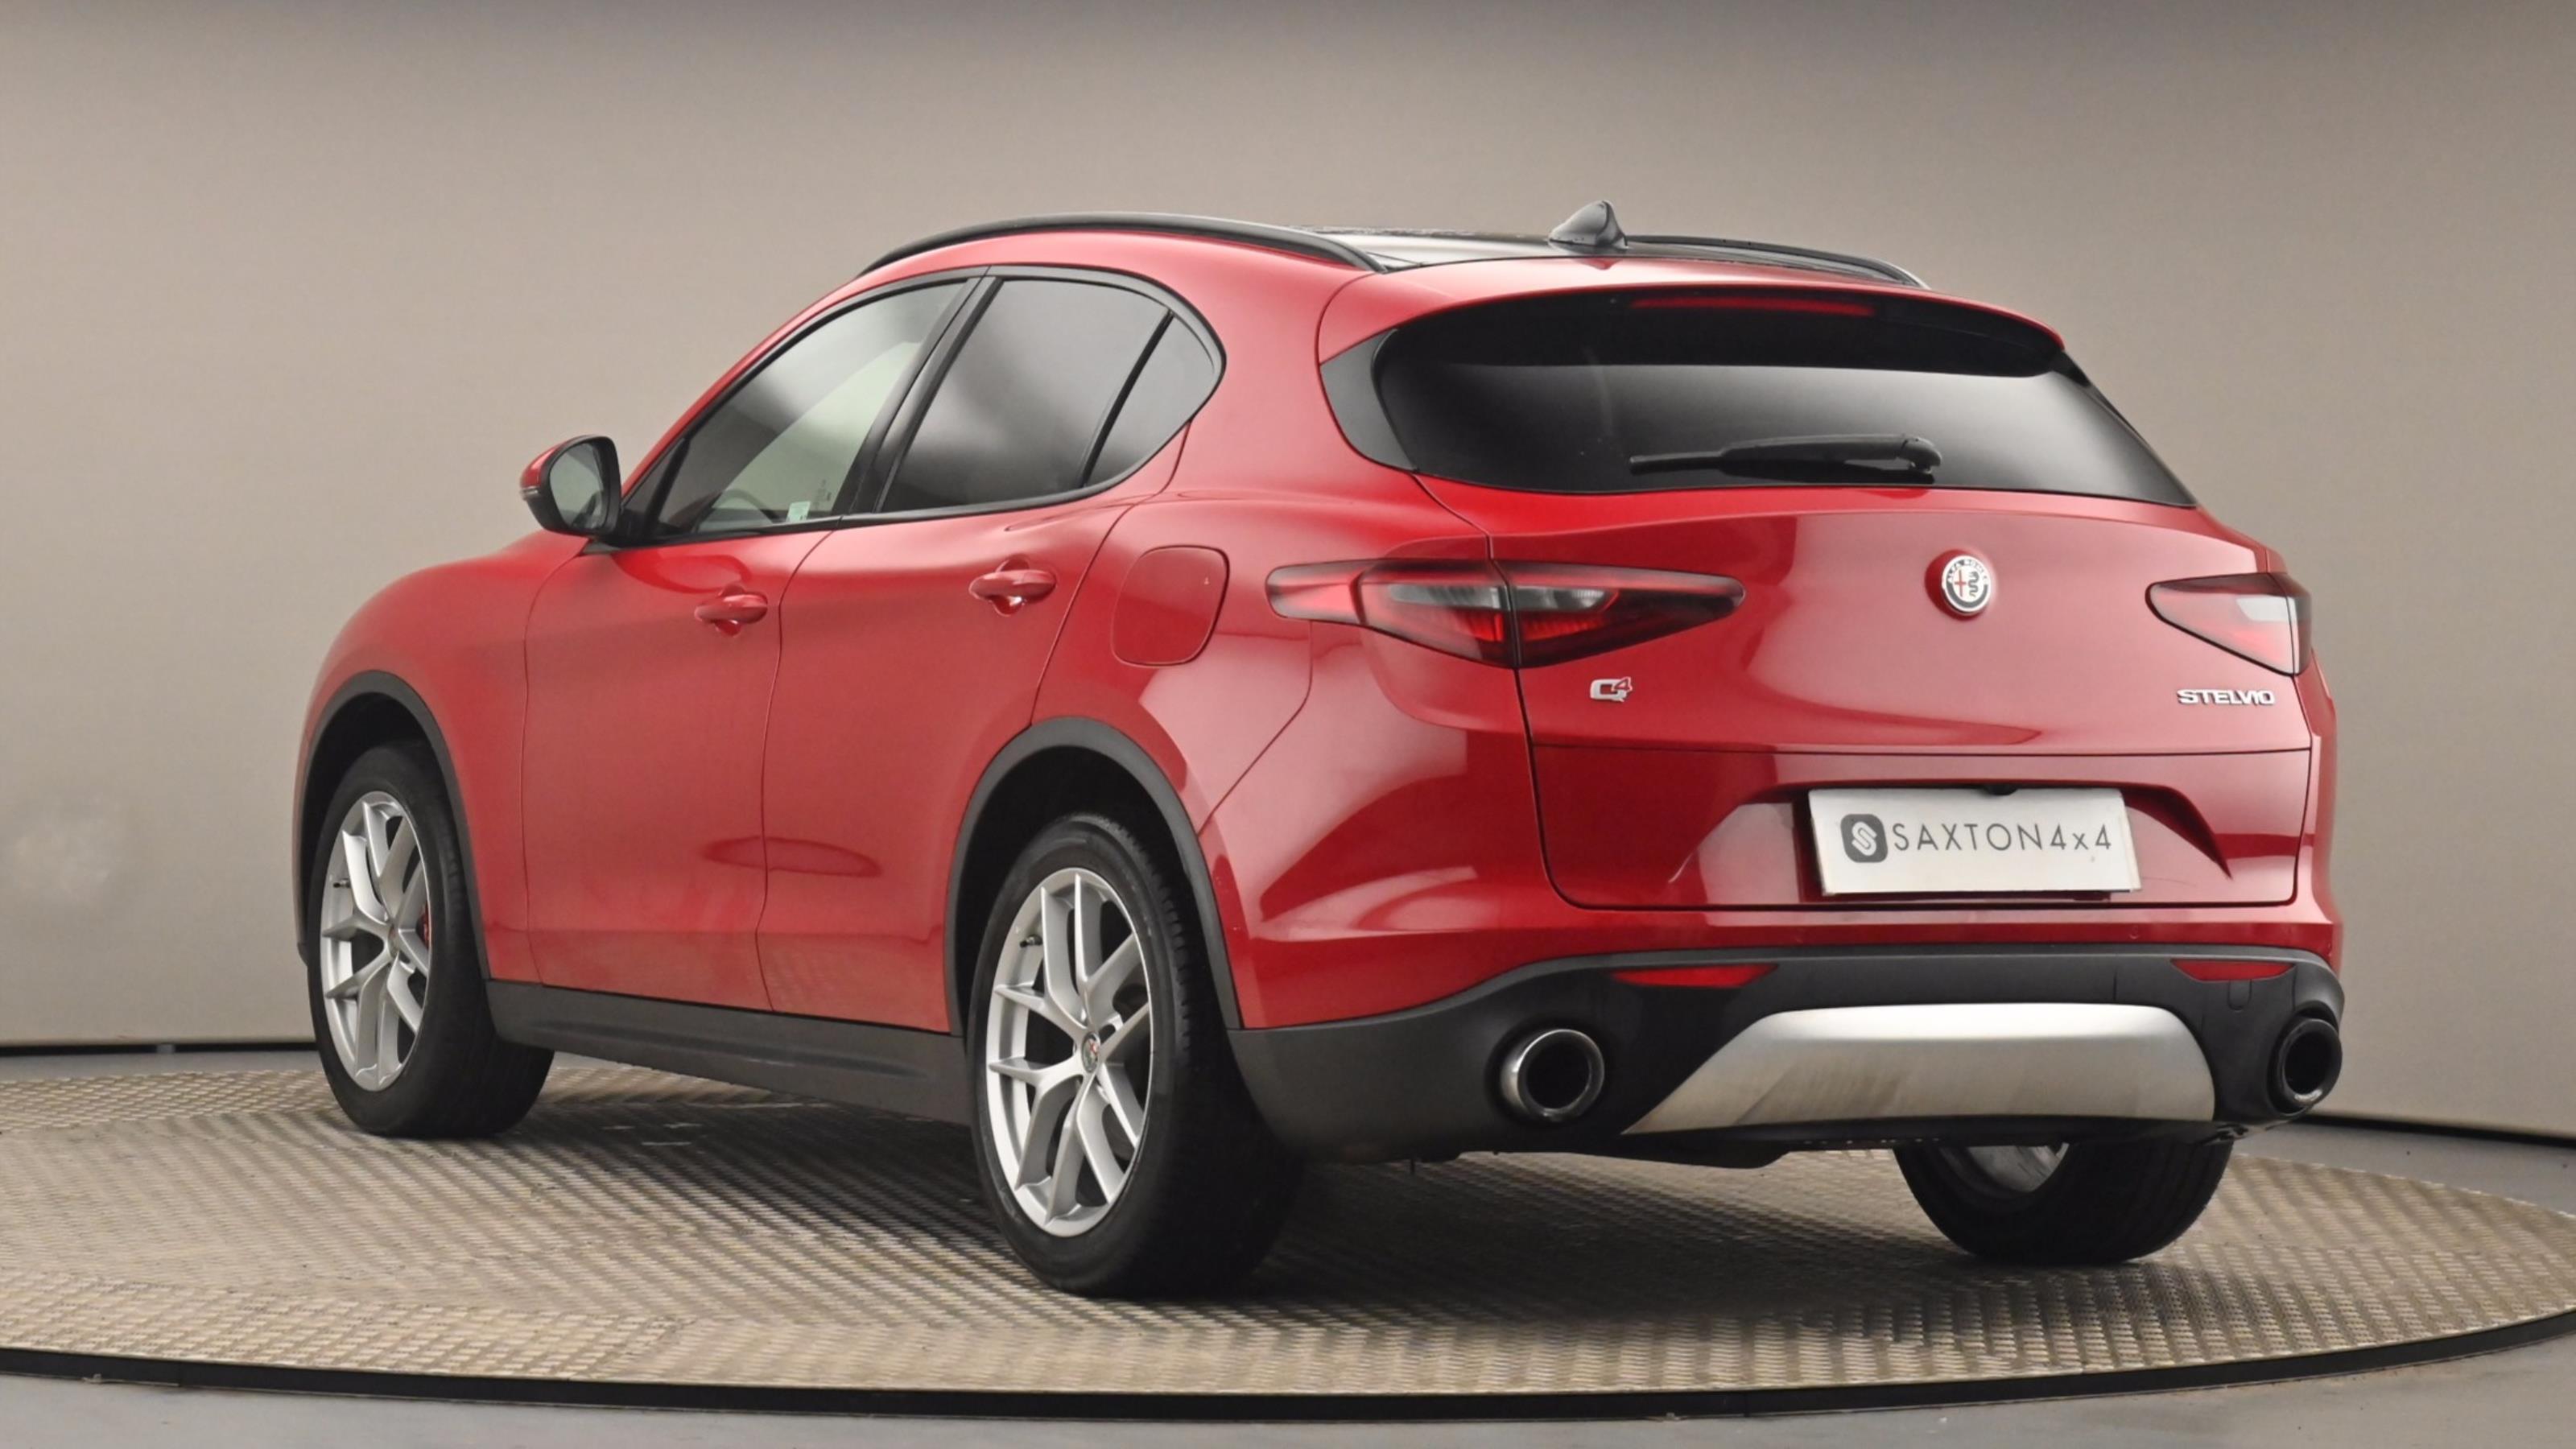 Used 2018 Alfa Romeo STELVIO 2.0 Turbo 280 Milano 5dr Auto RED at Saxton4x4